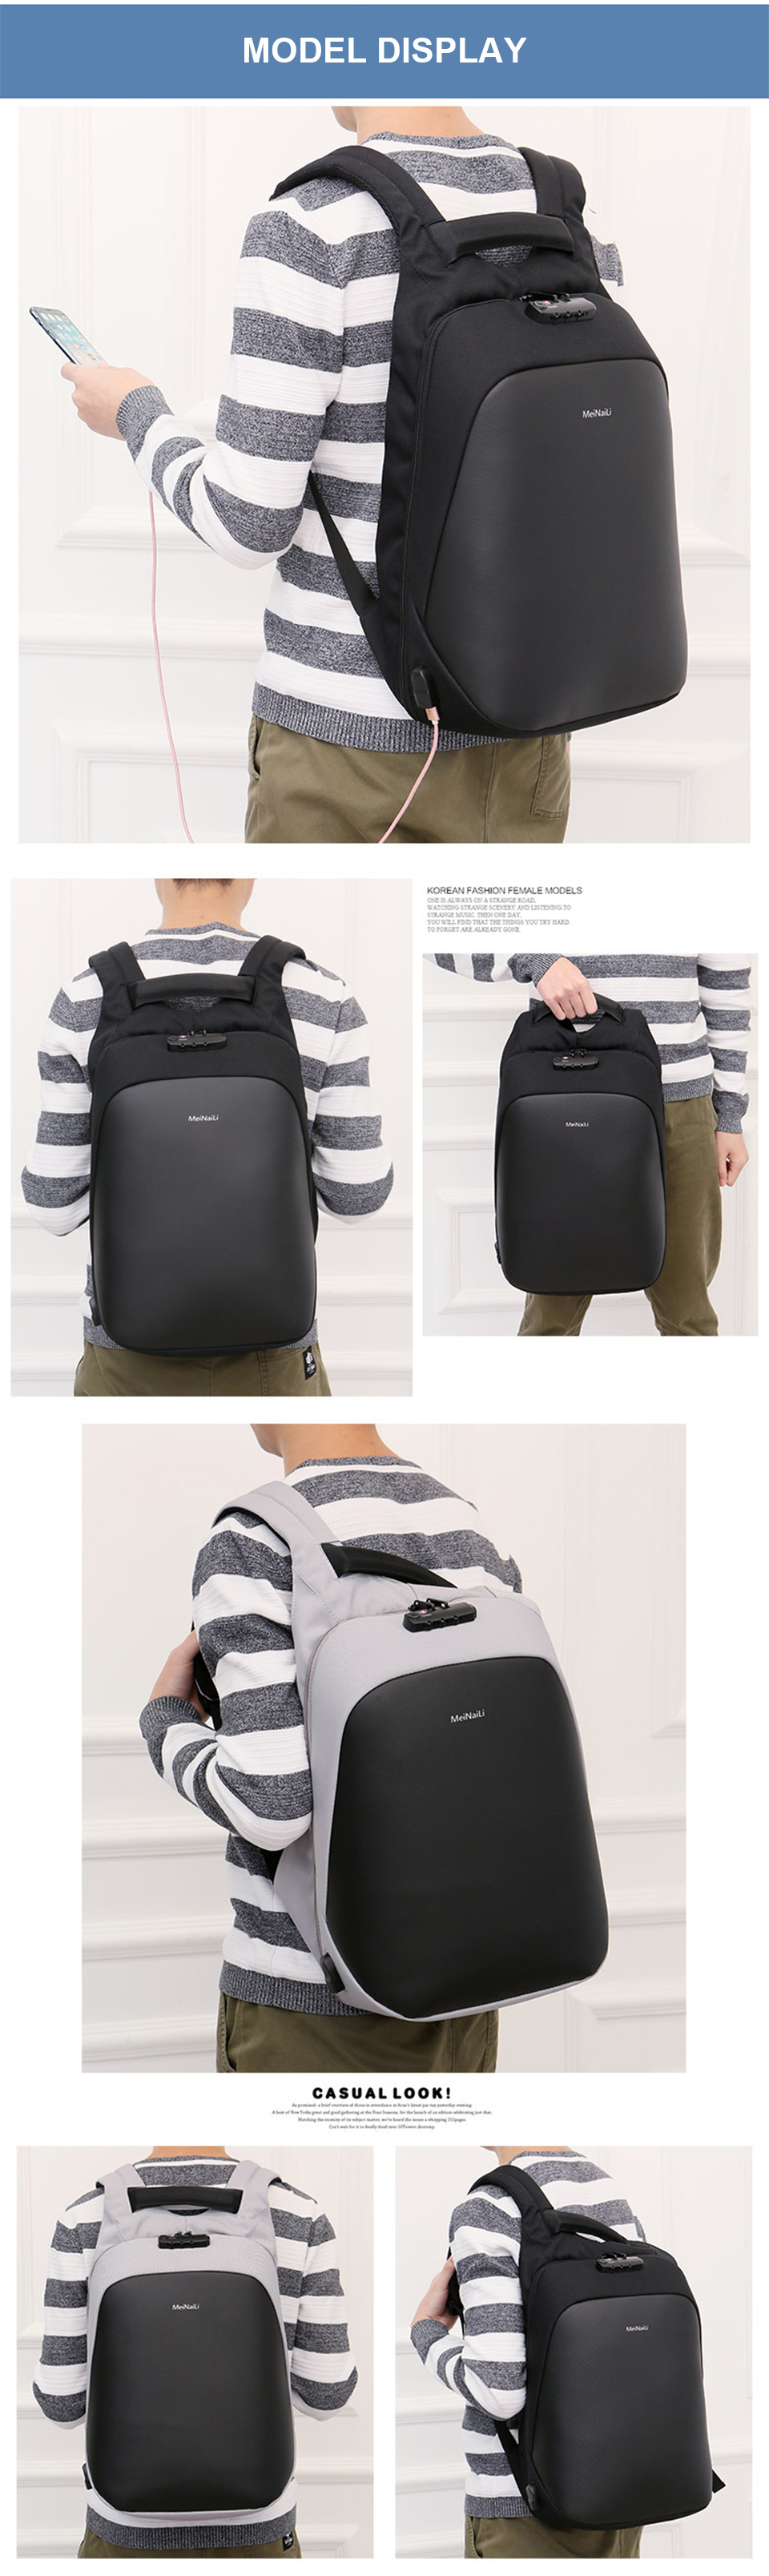 8 Anti-theft Backpack Men Backpacks Laptop 15.6'' Business Travel Luggage Bag Pack Waterproof USB Password Lock Male Backpacking